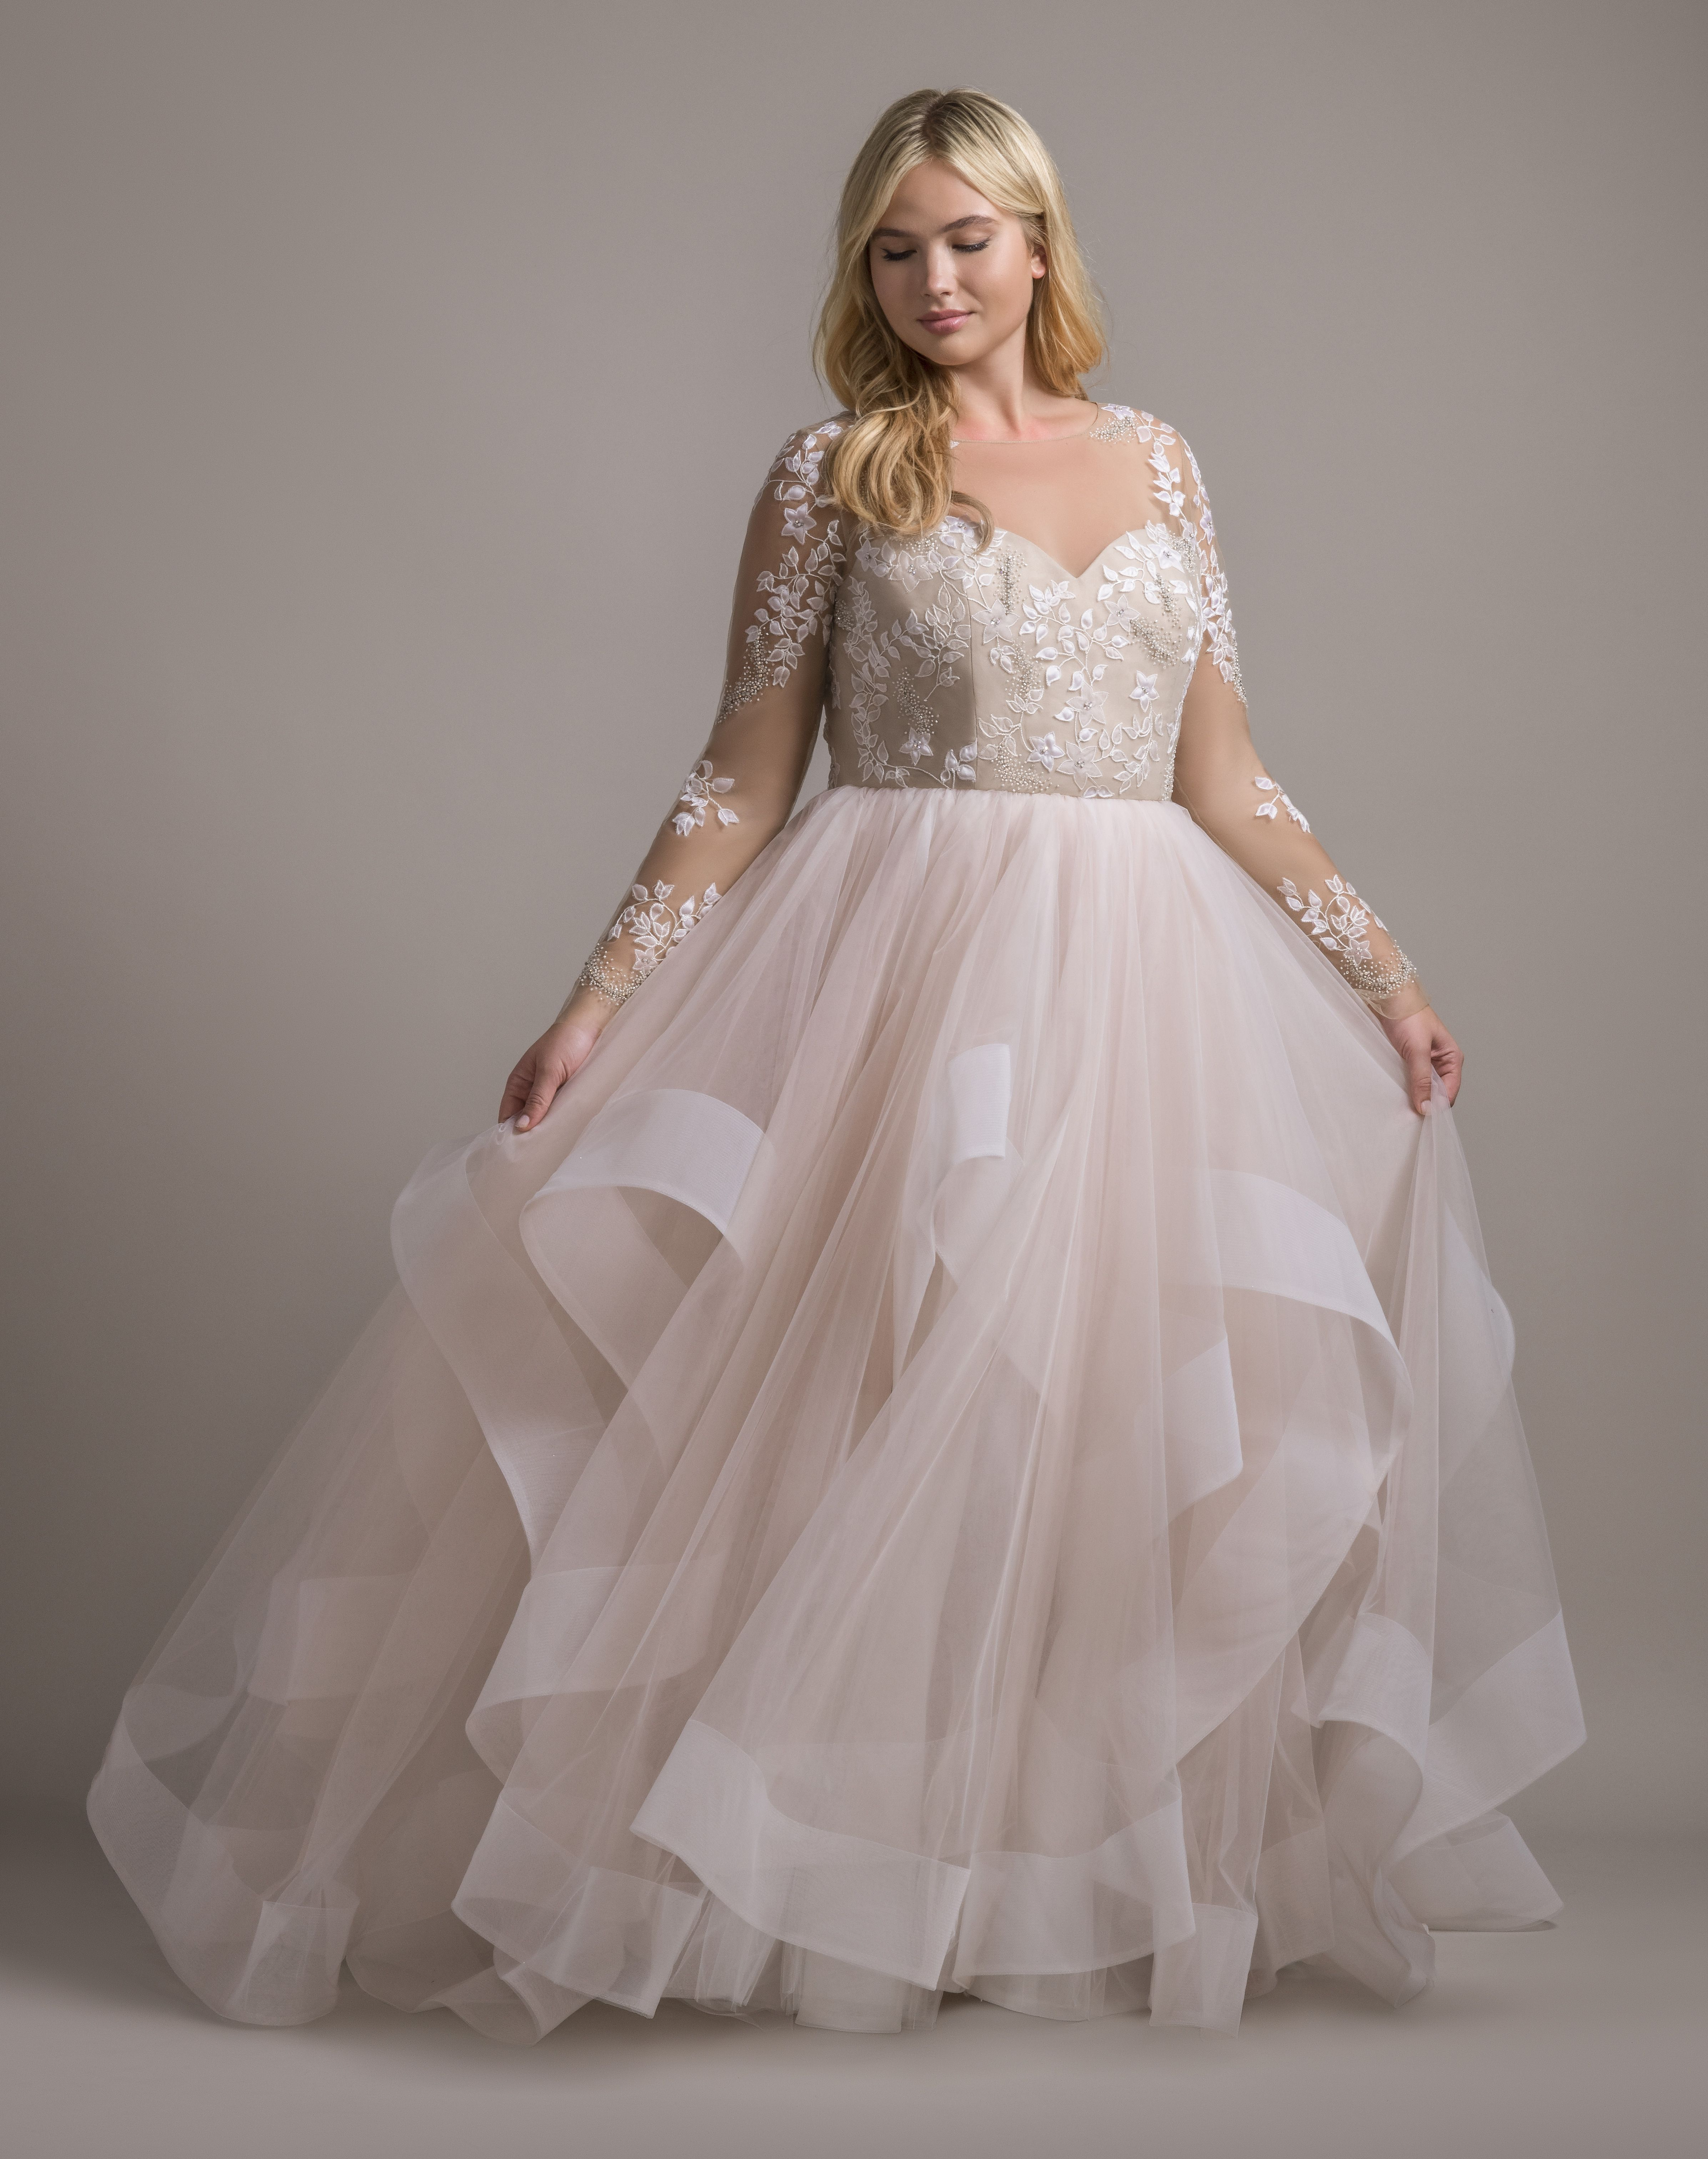 13+ Tiered wedding dress style info